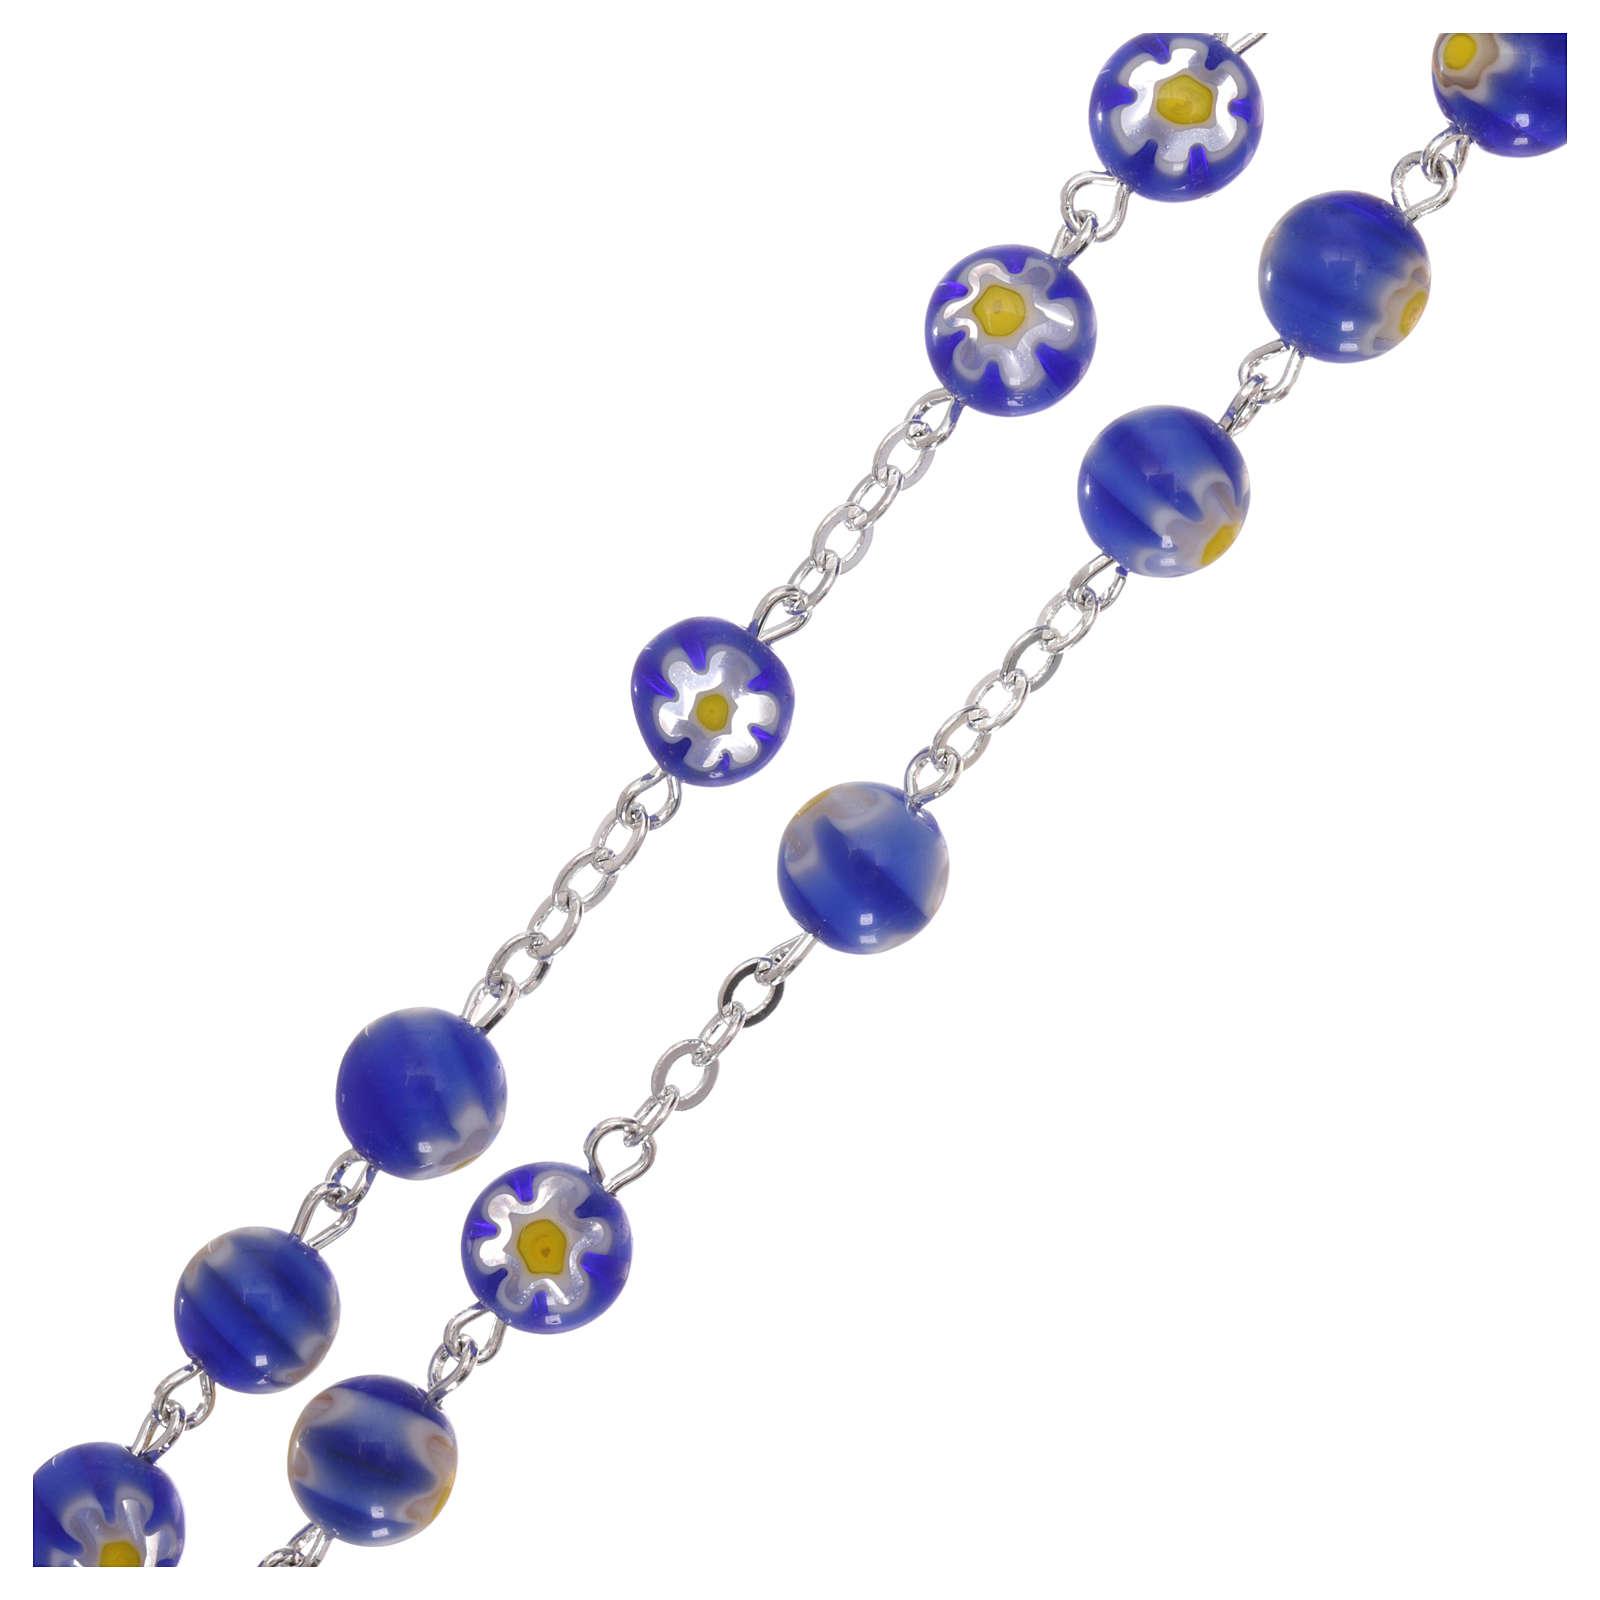 Rosario vidrio estilo Murrina azul motivo floreal cuentas 8 mm 4